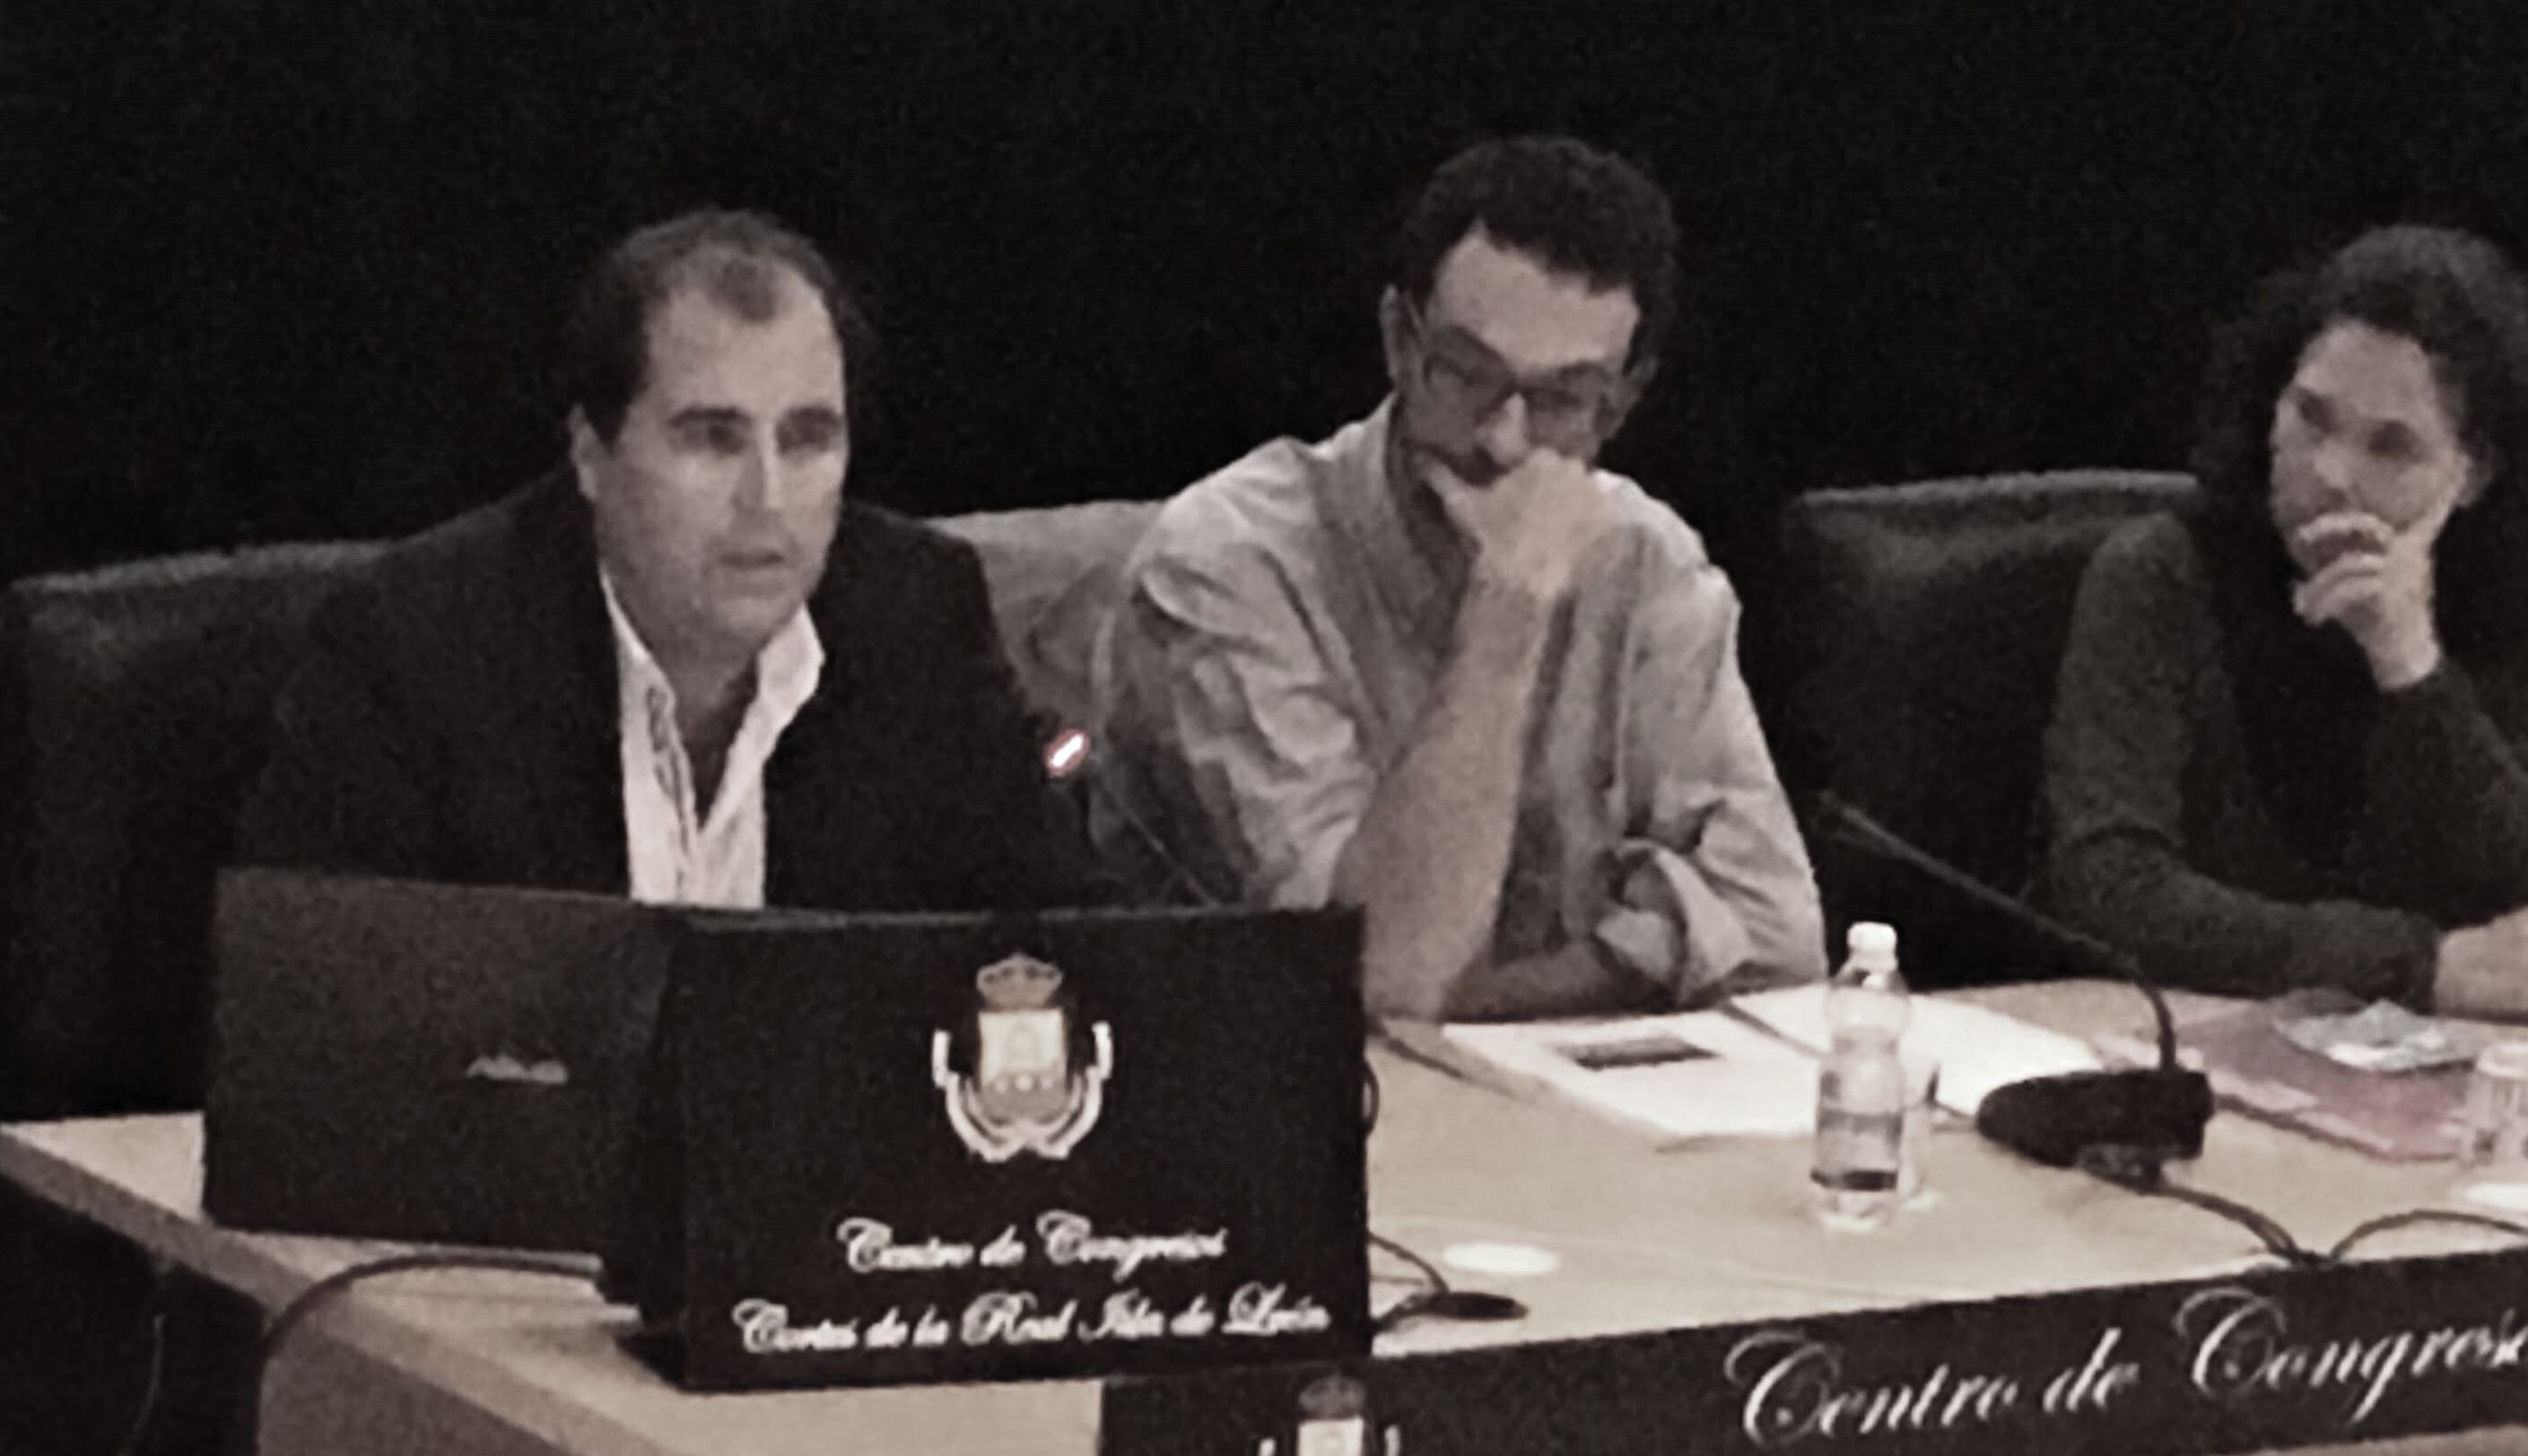 De izda. a dcha.: Eduardo Vijande Vila, Francisco Terán Santander y Margarita Ristori Romero